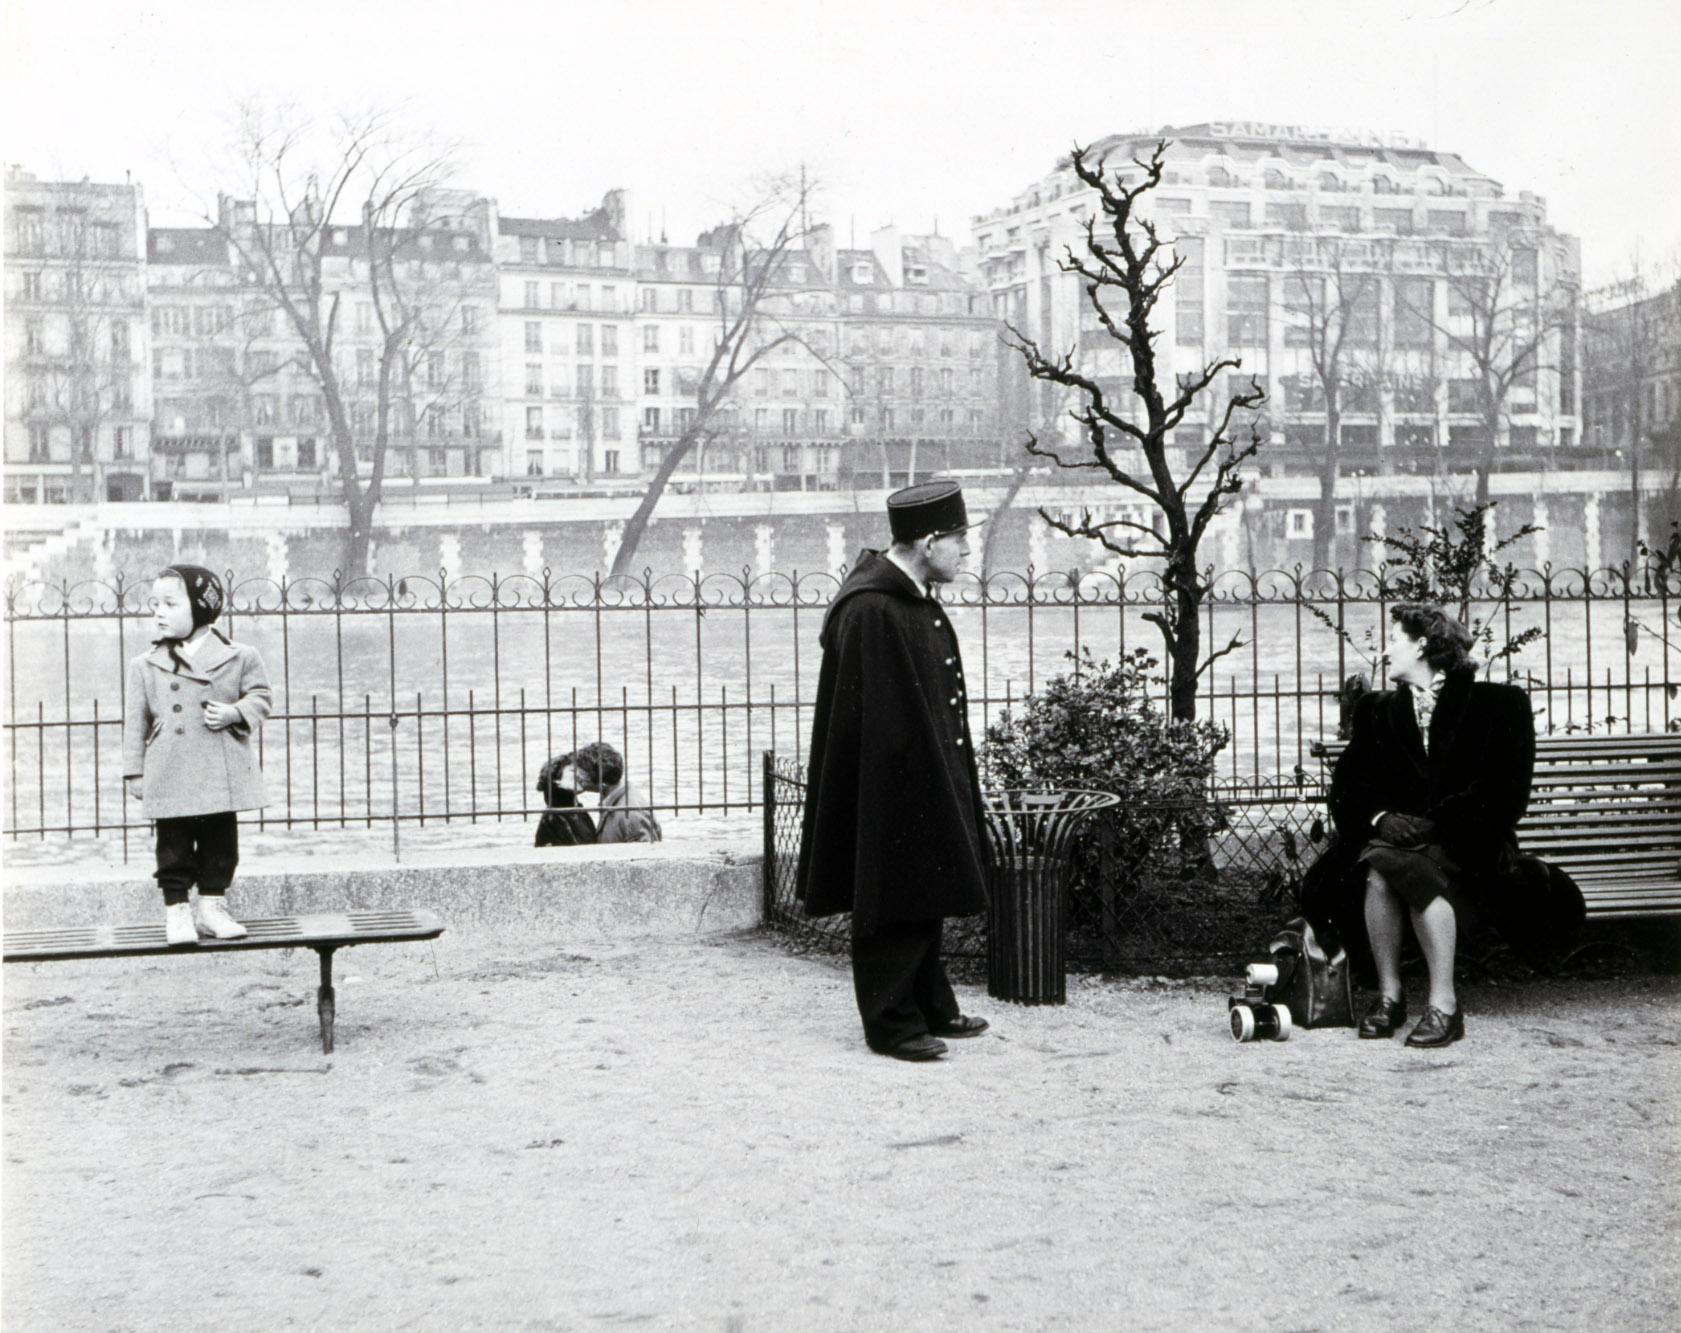 doisneau-robert-les-amoureux-du-vert-galant-1950-01.jpg